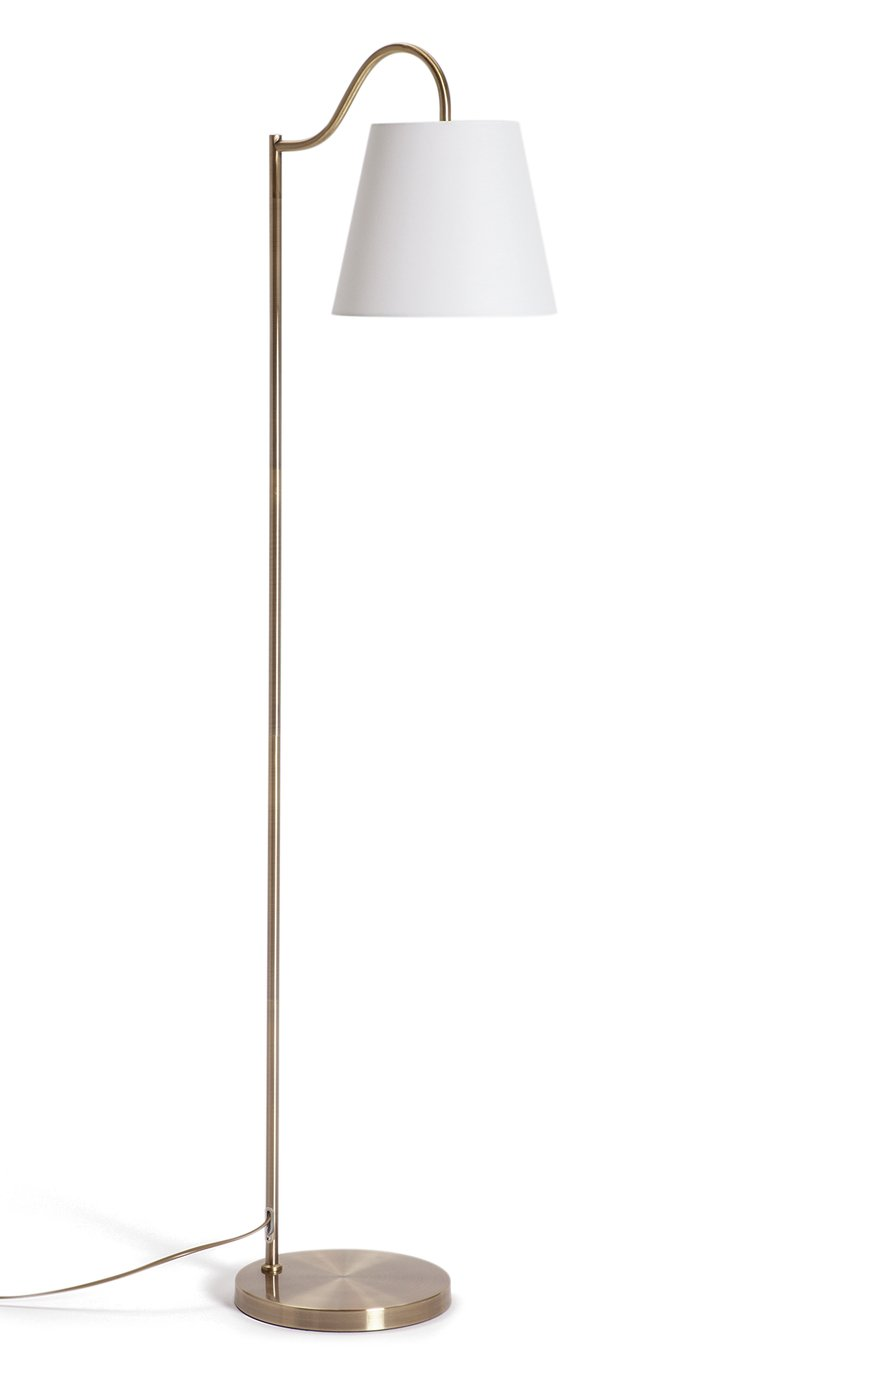 Argos Home Gooseneck Floor Lamp - Brass